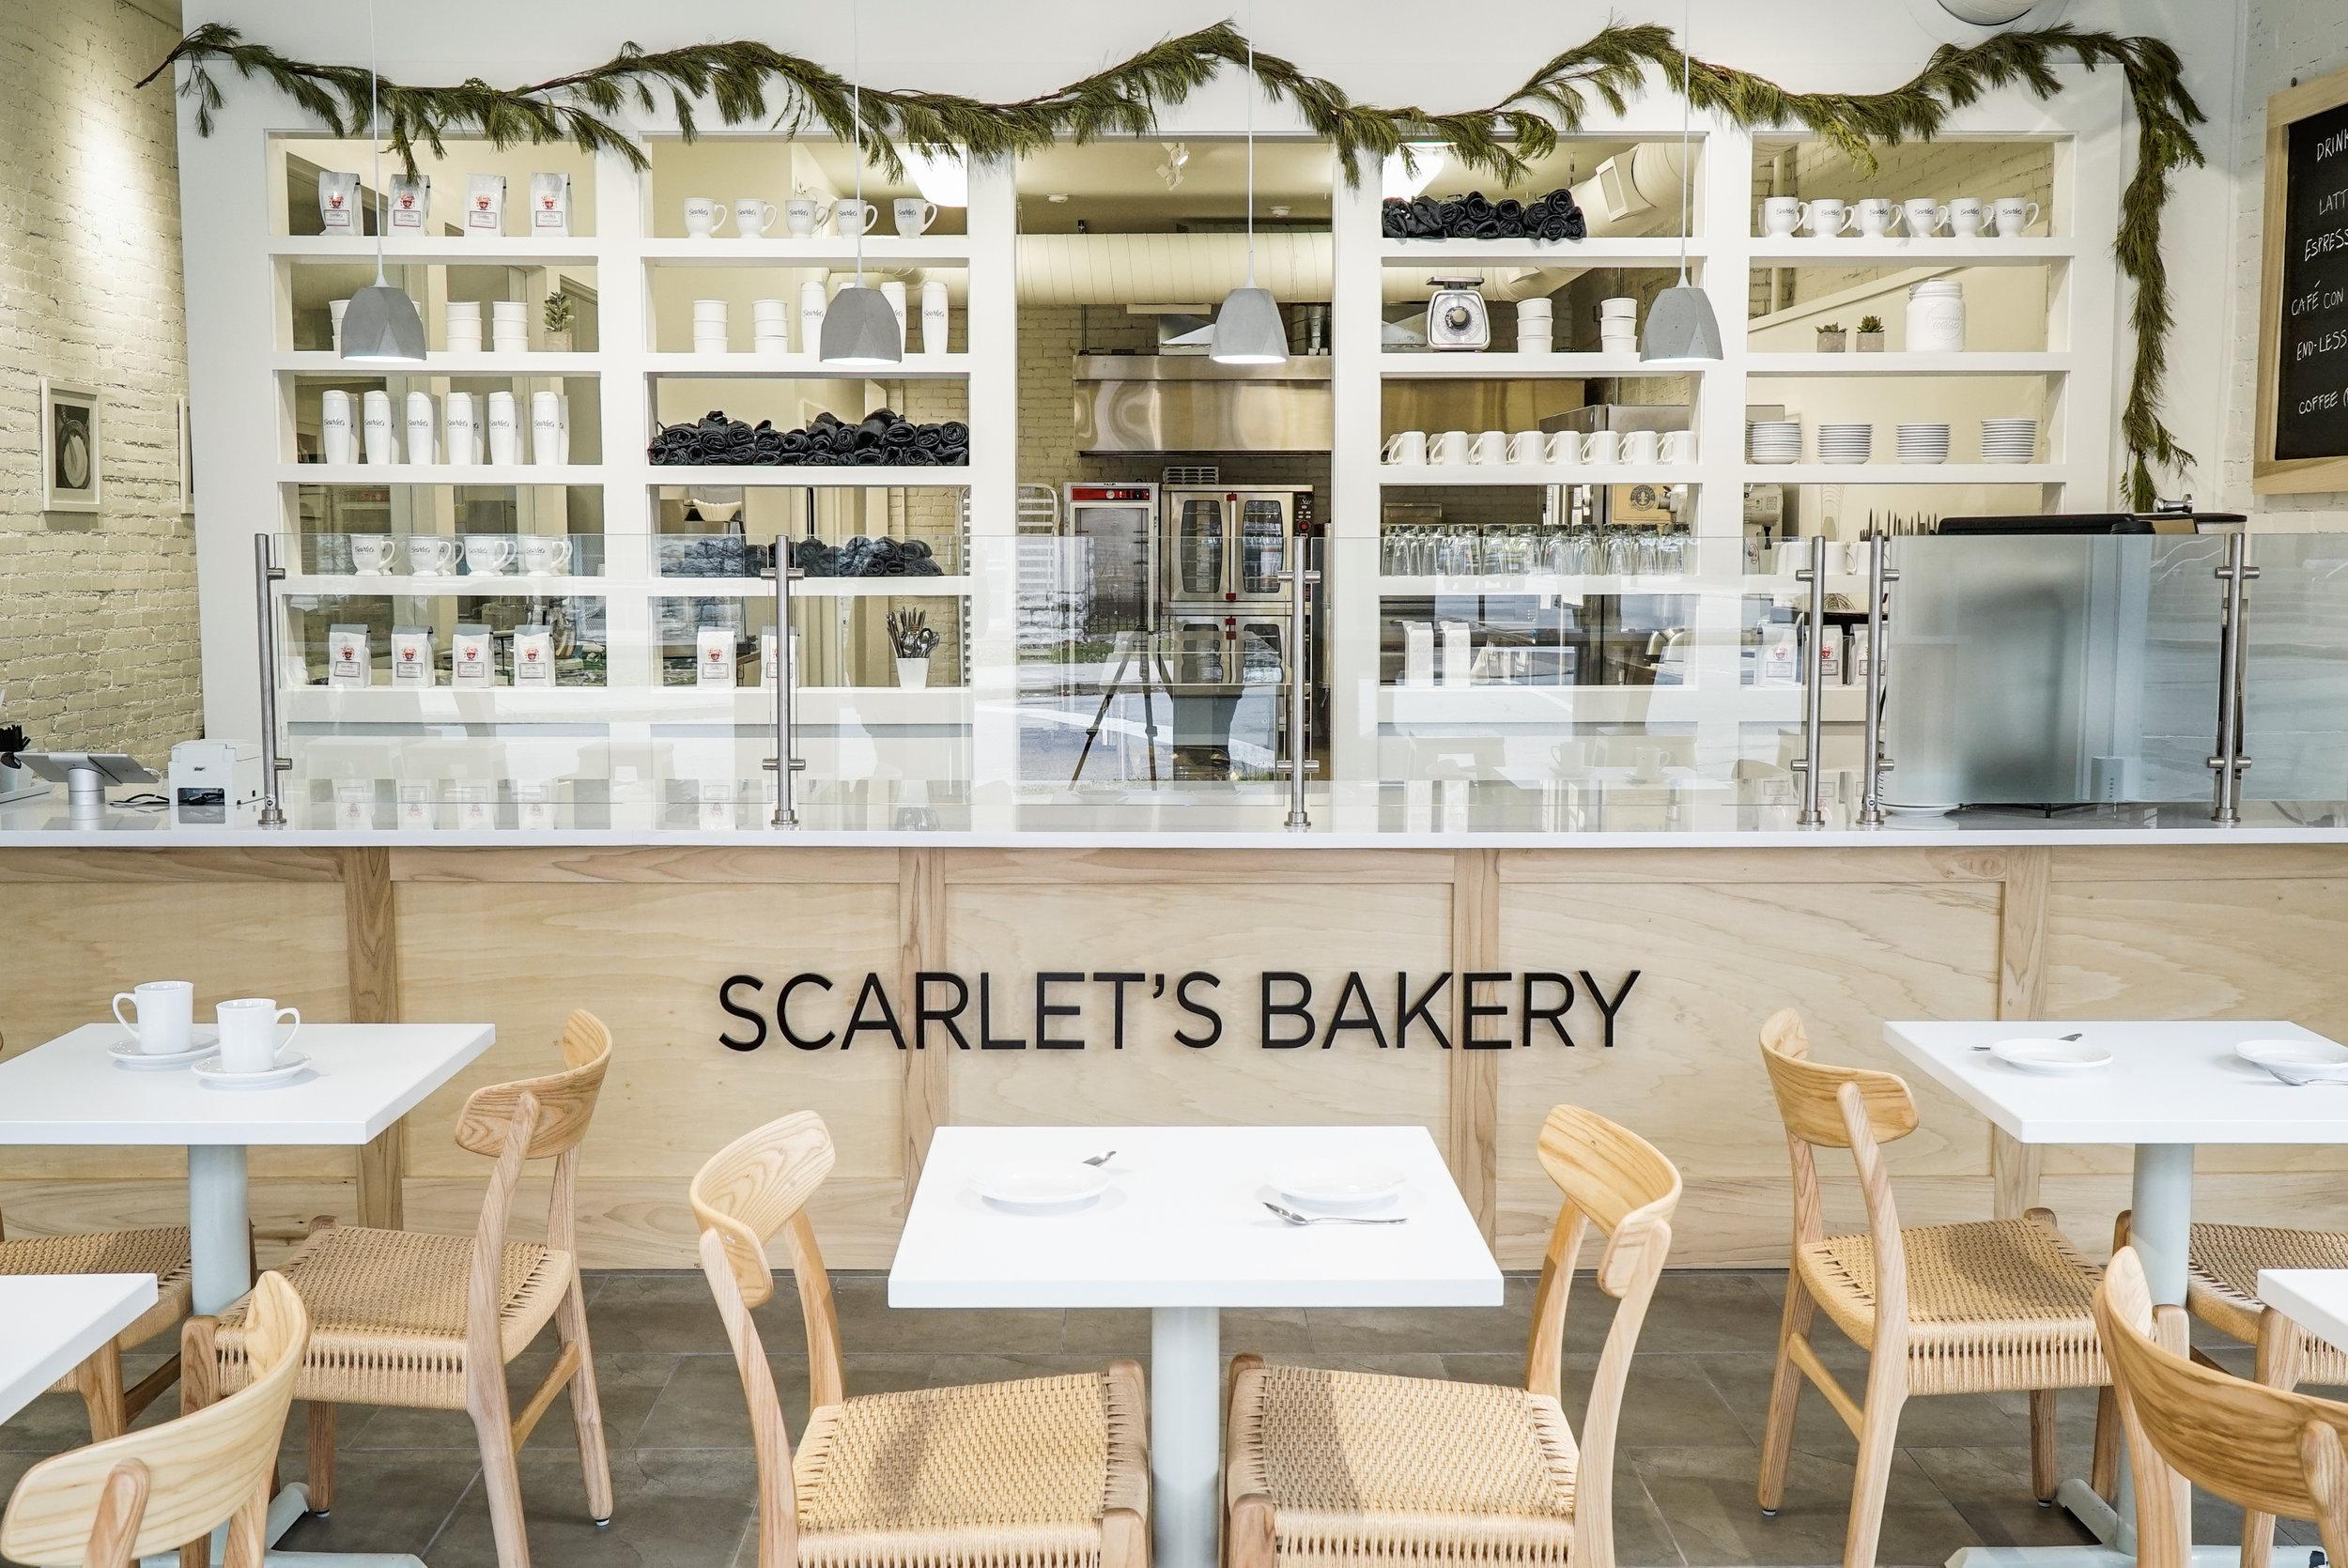 Scarlet's-Bakery-5.jpg